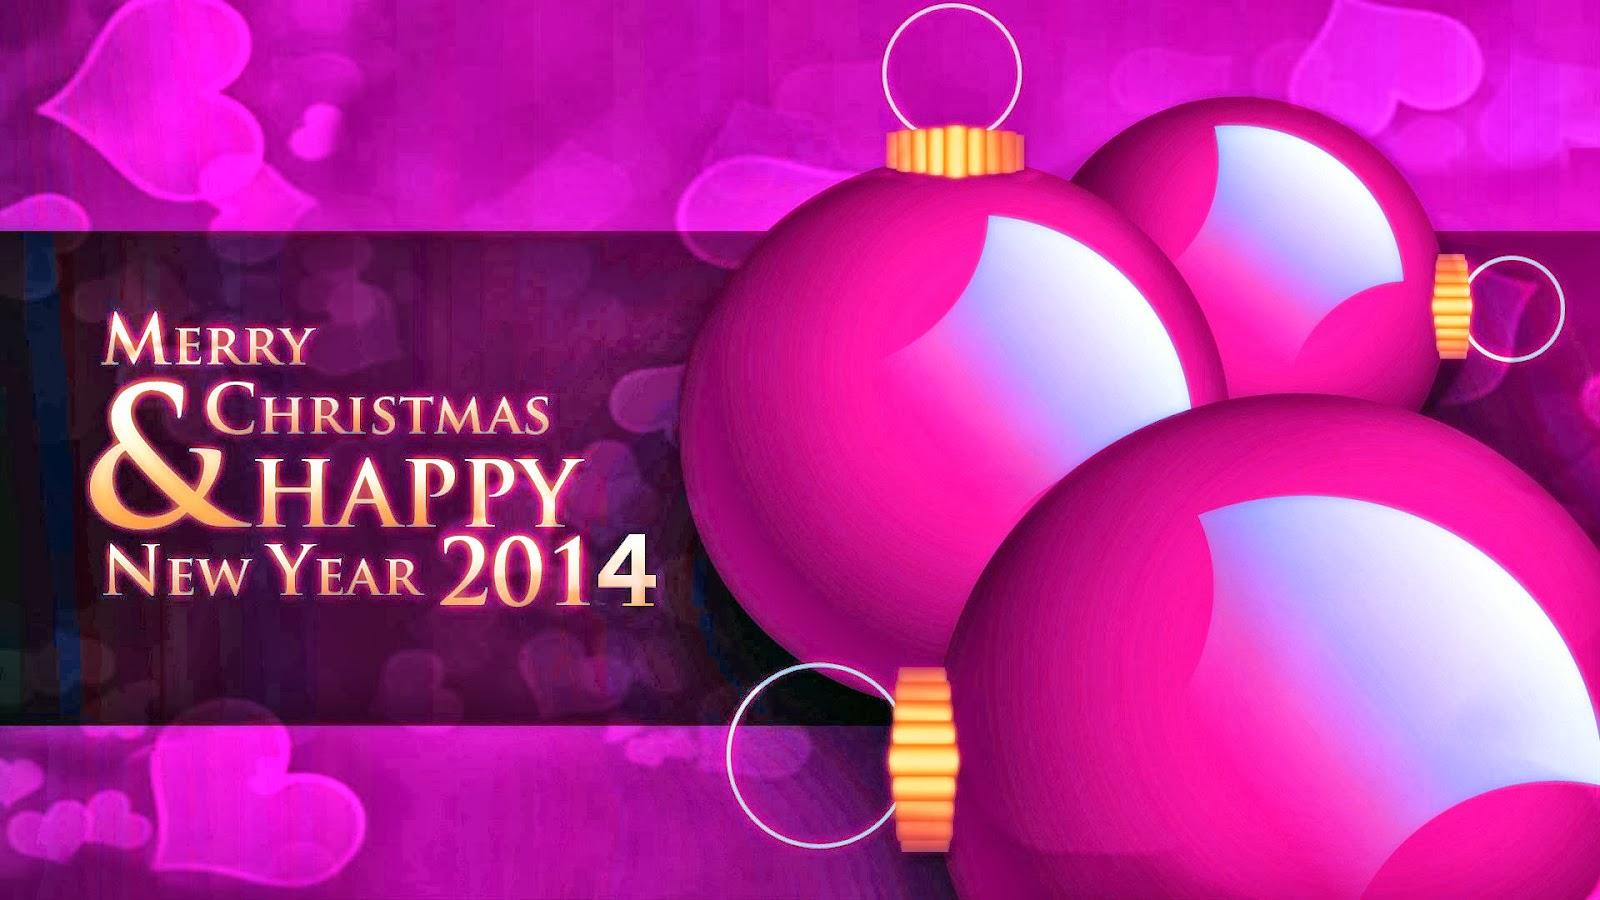 Happy New Year 2015Wallpapers for Desktop 11 1600x900